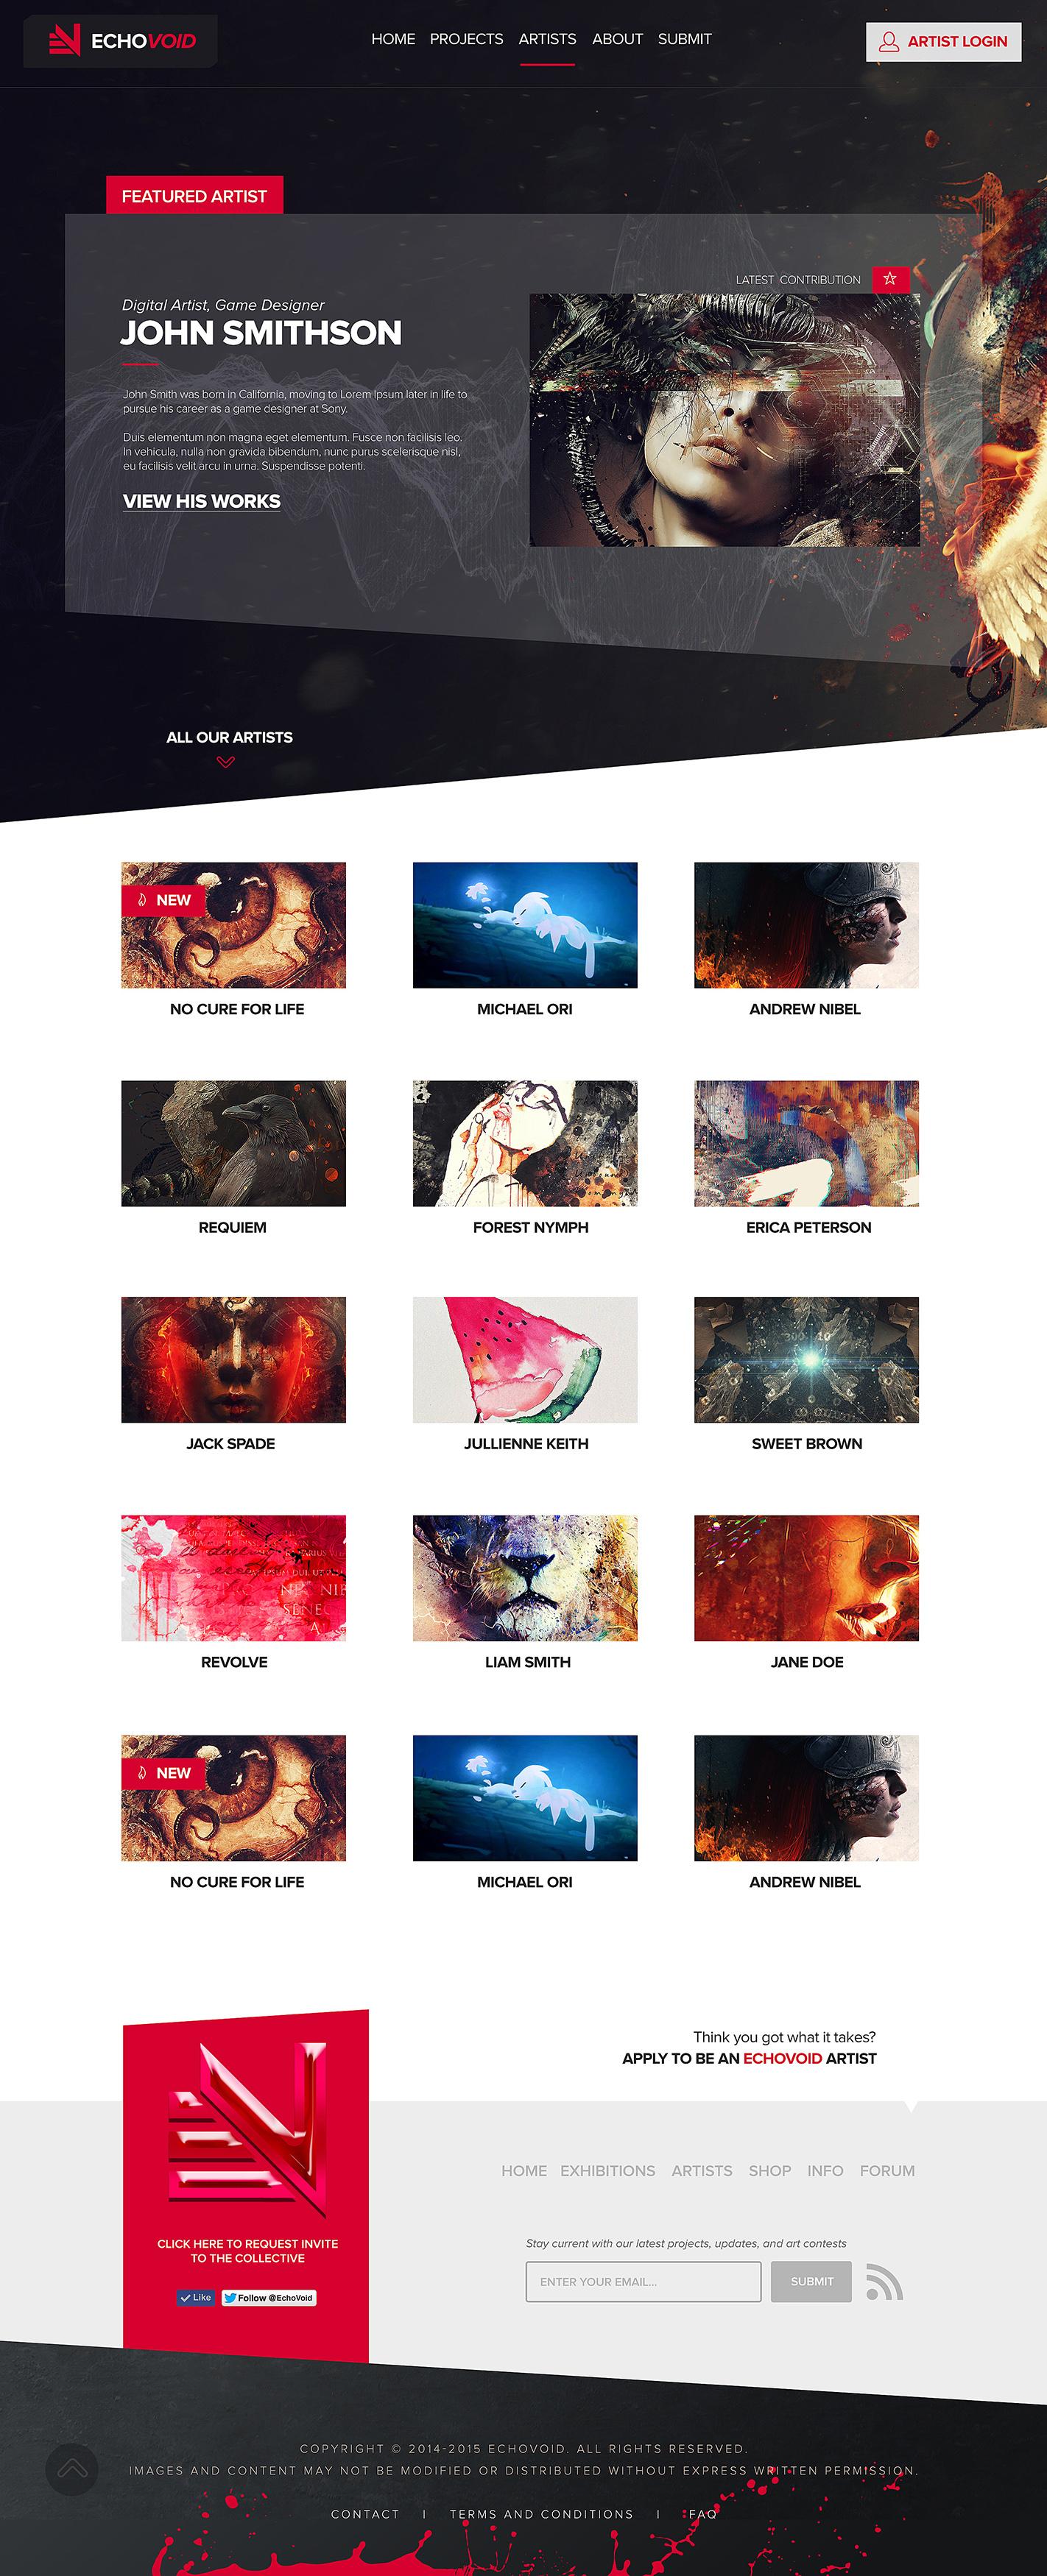 EchoVoid-ArtistCommunity-Artists